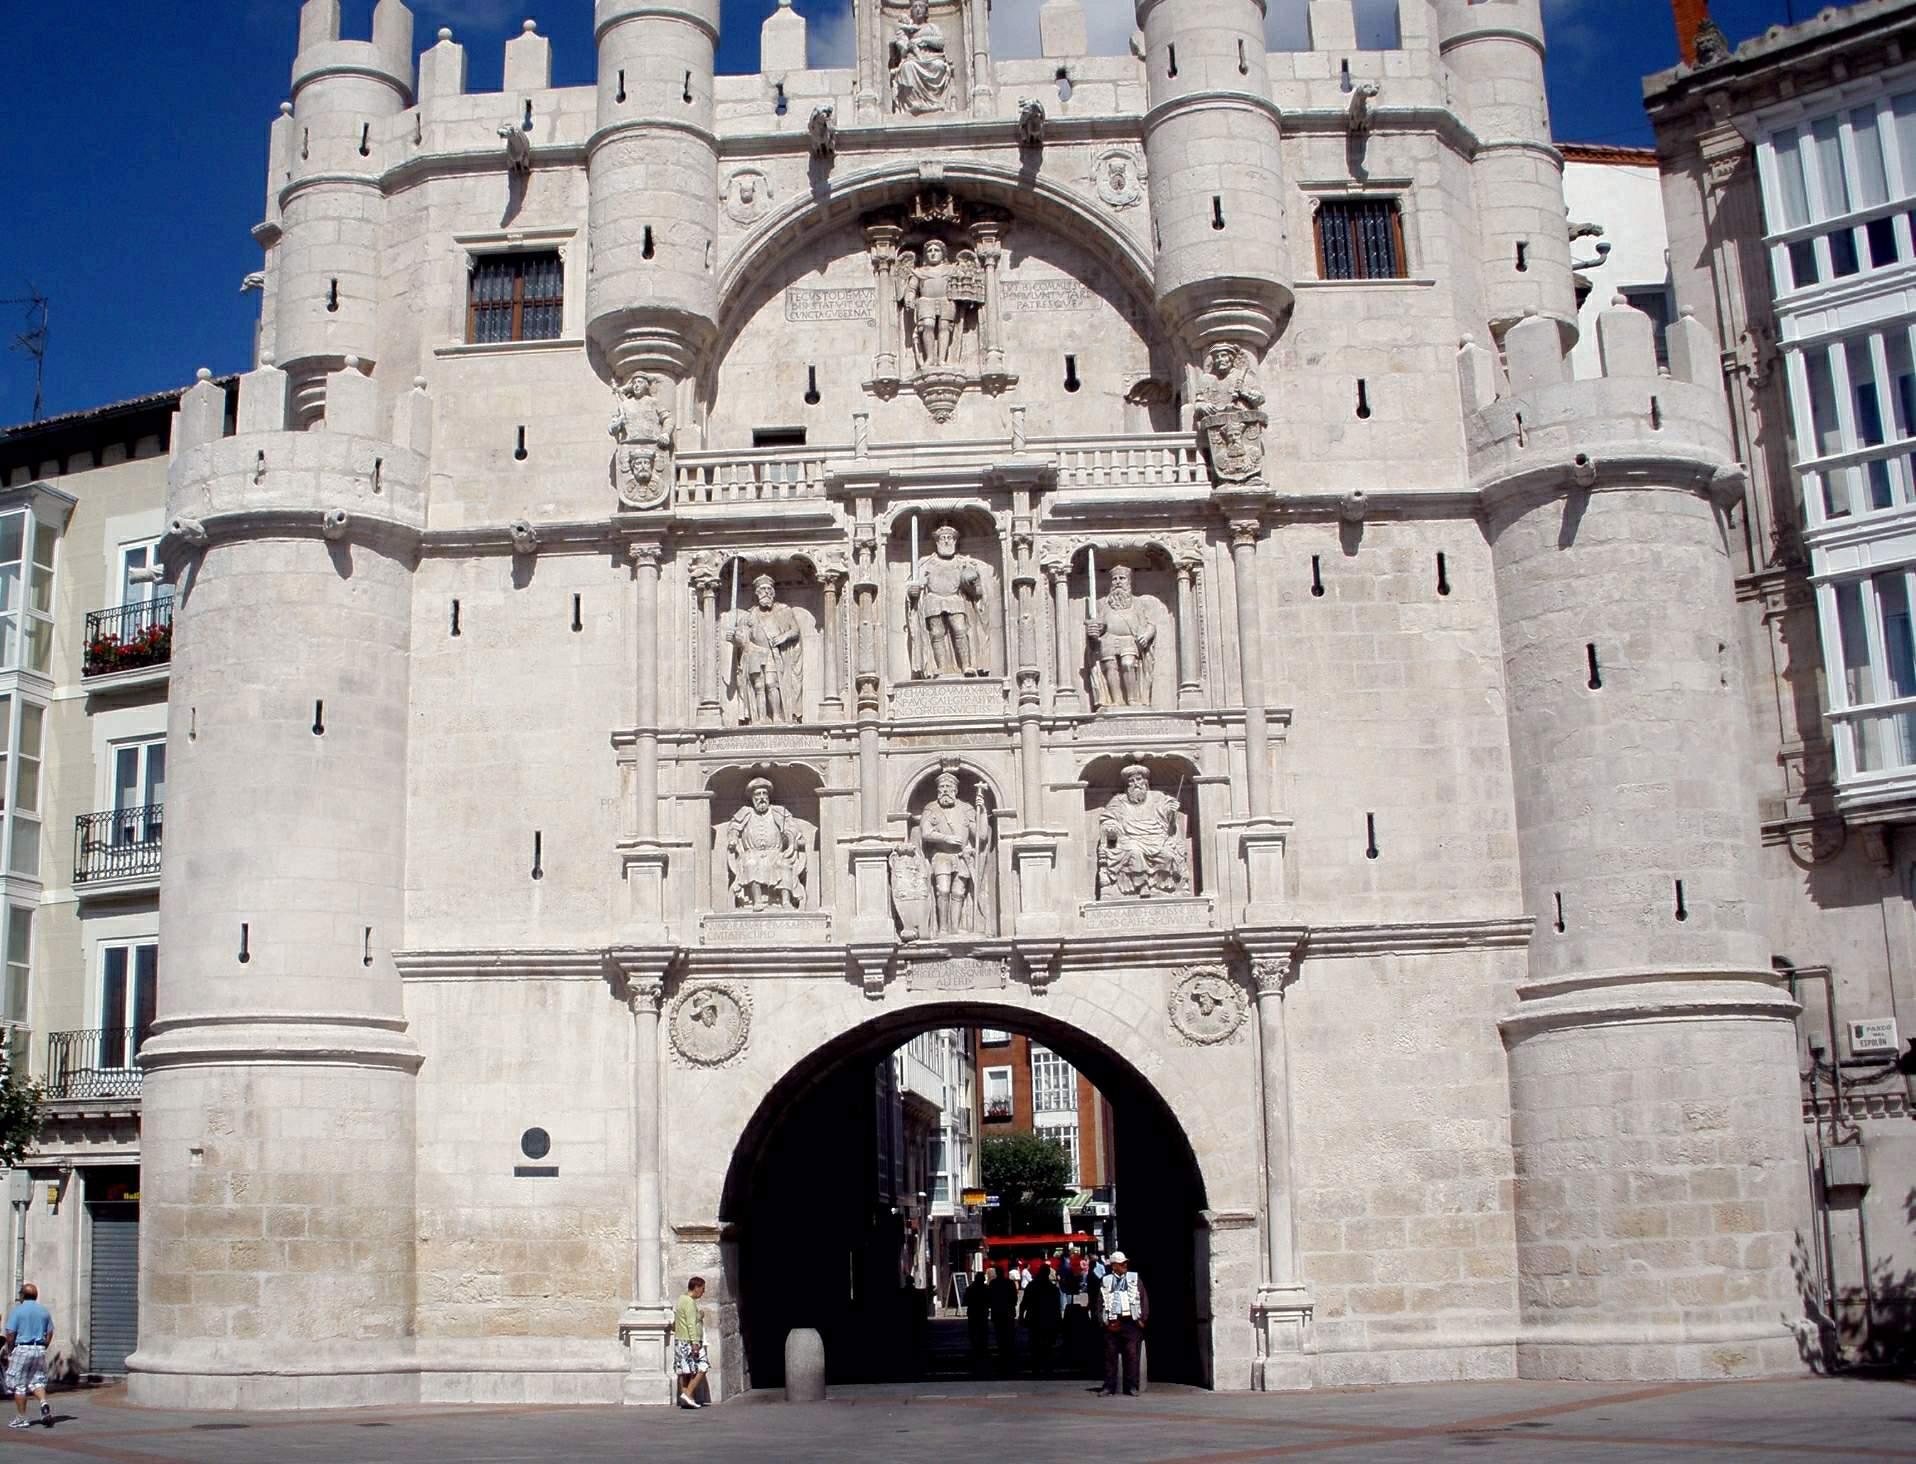 File:Burgos - Arco de Santa Maria 20.JPG - Wikimedia Commons